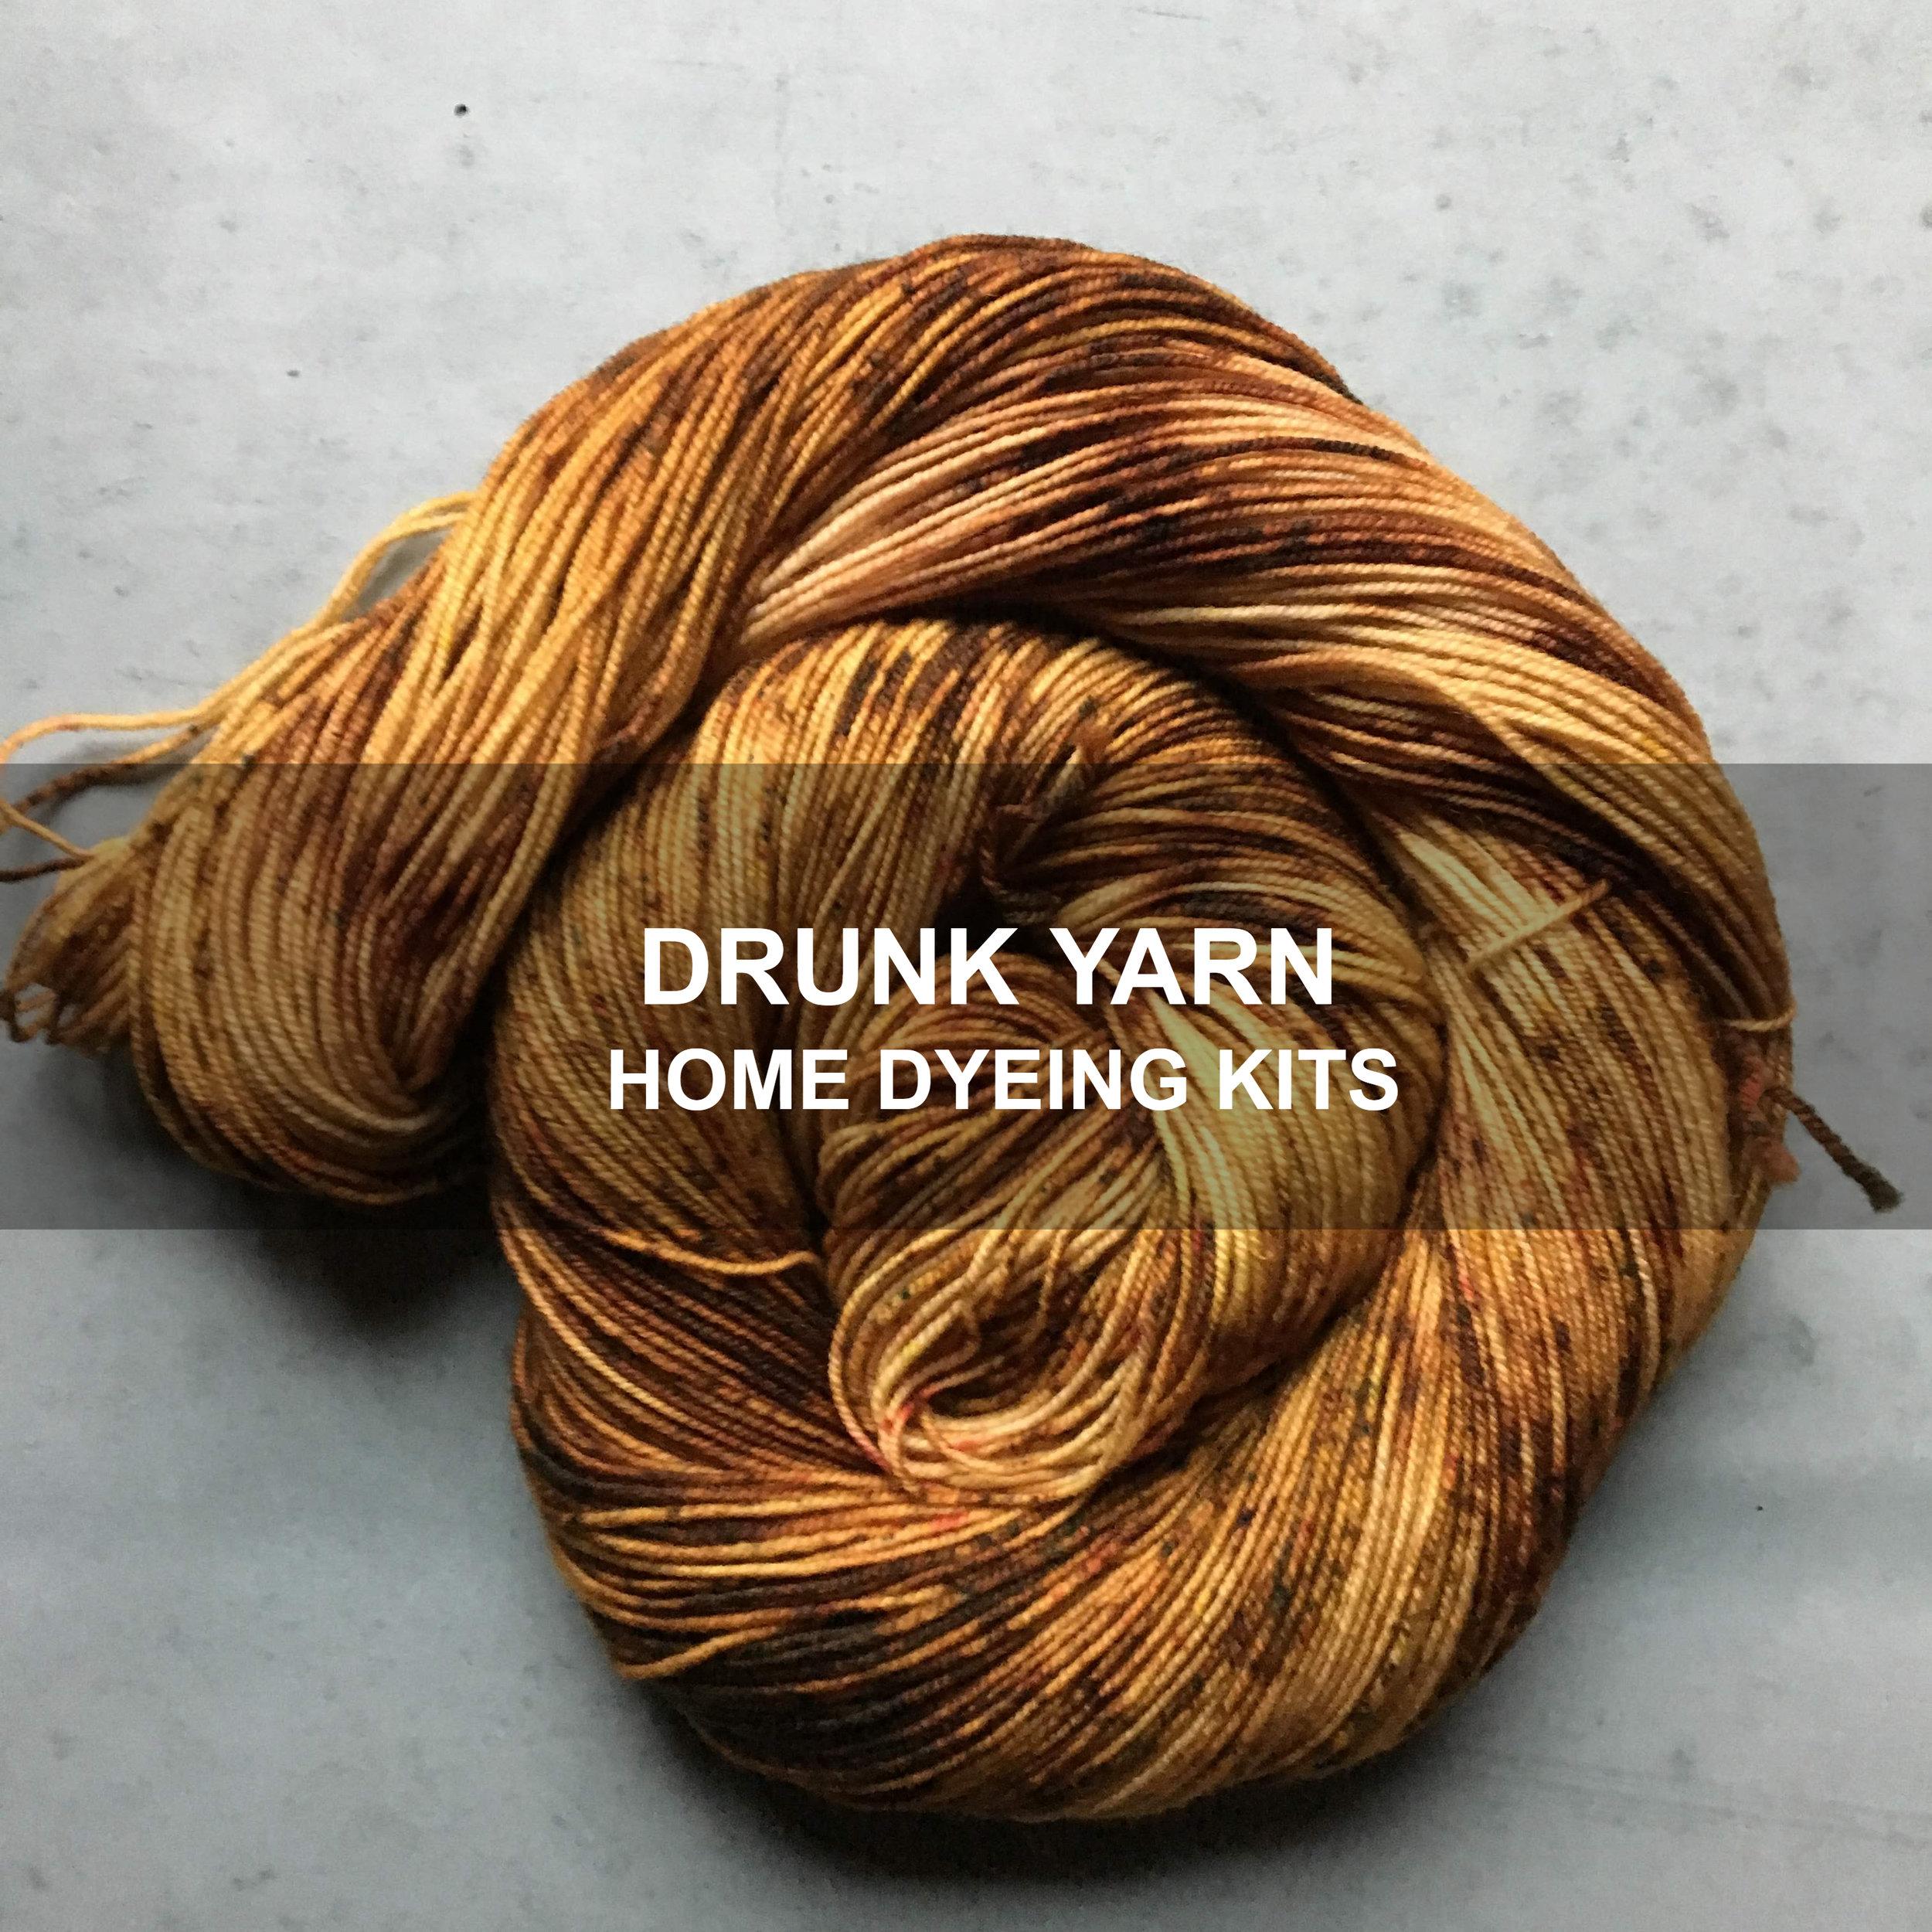 DRUNK YARN clicker.jpg